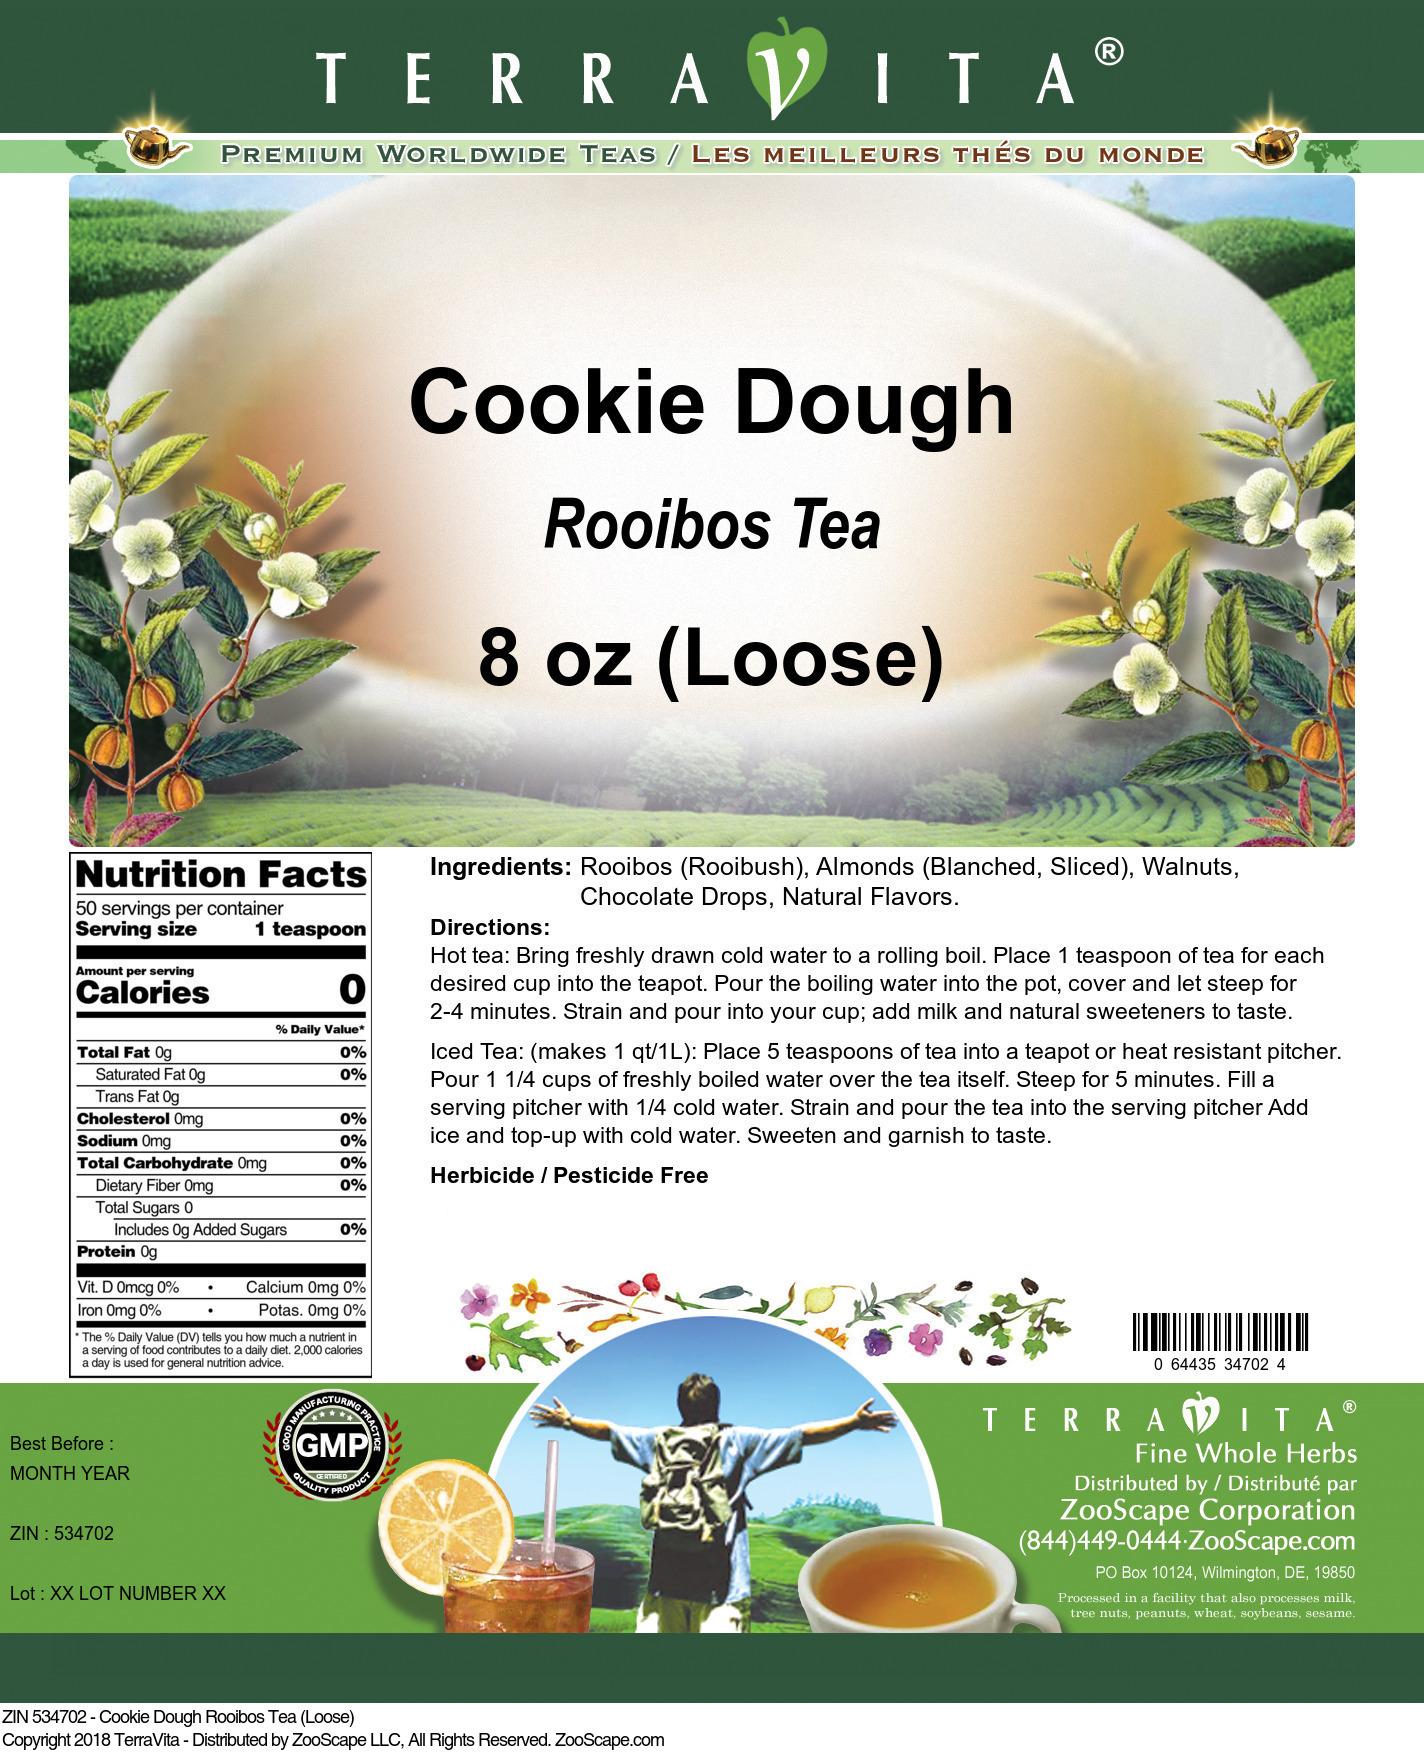 Cookie Dough Rooibos Tea (Loose)